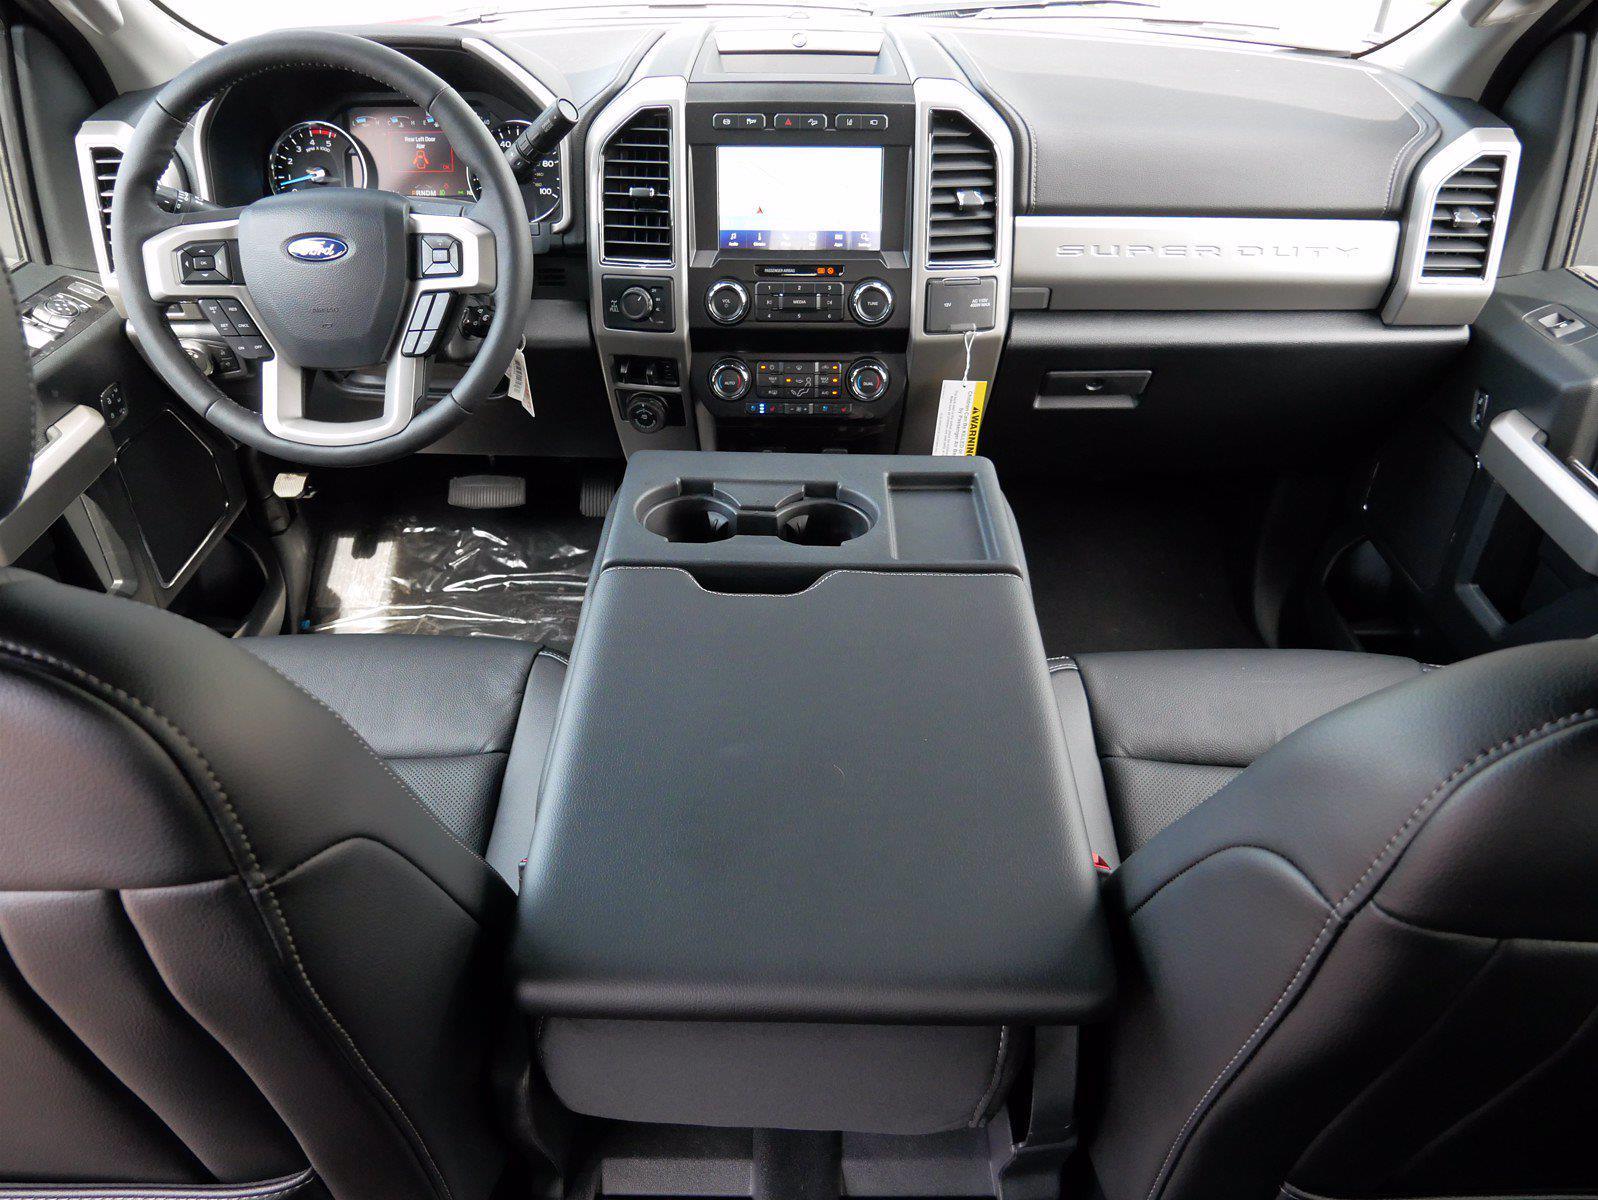 2021 Ford F-350 Crew Cab 4x4, Pickup #24540 - photo 25